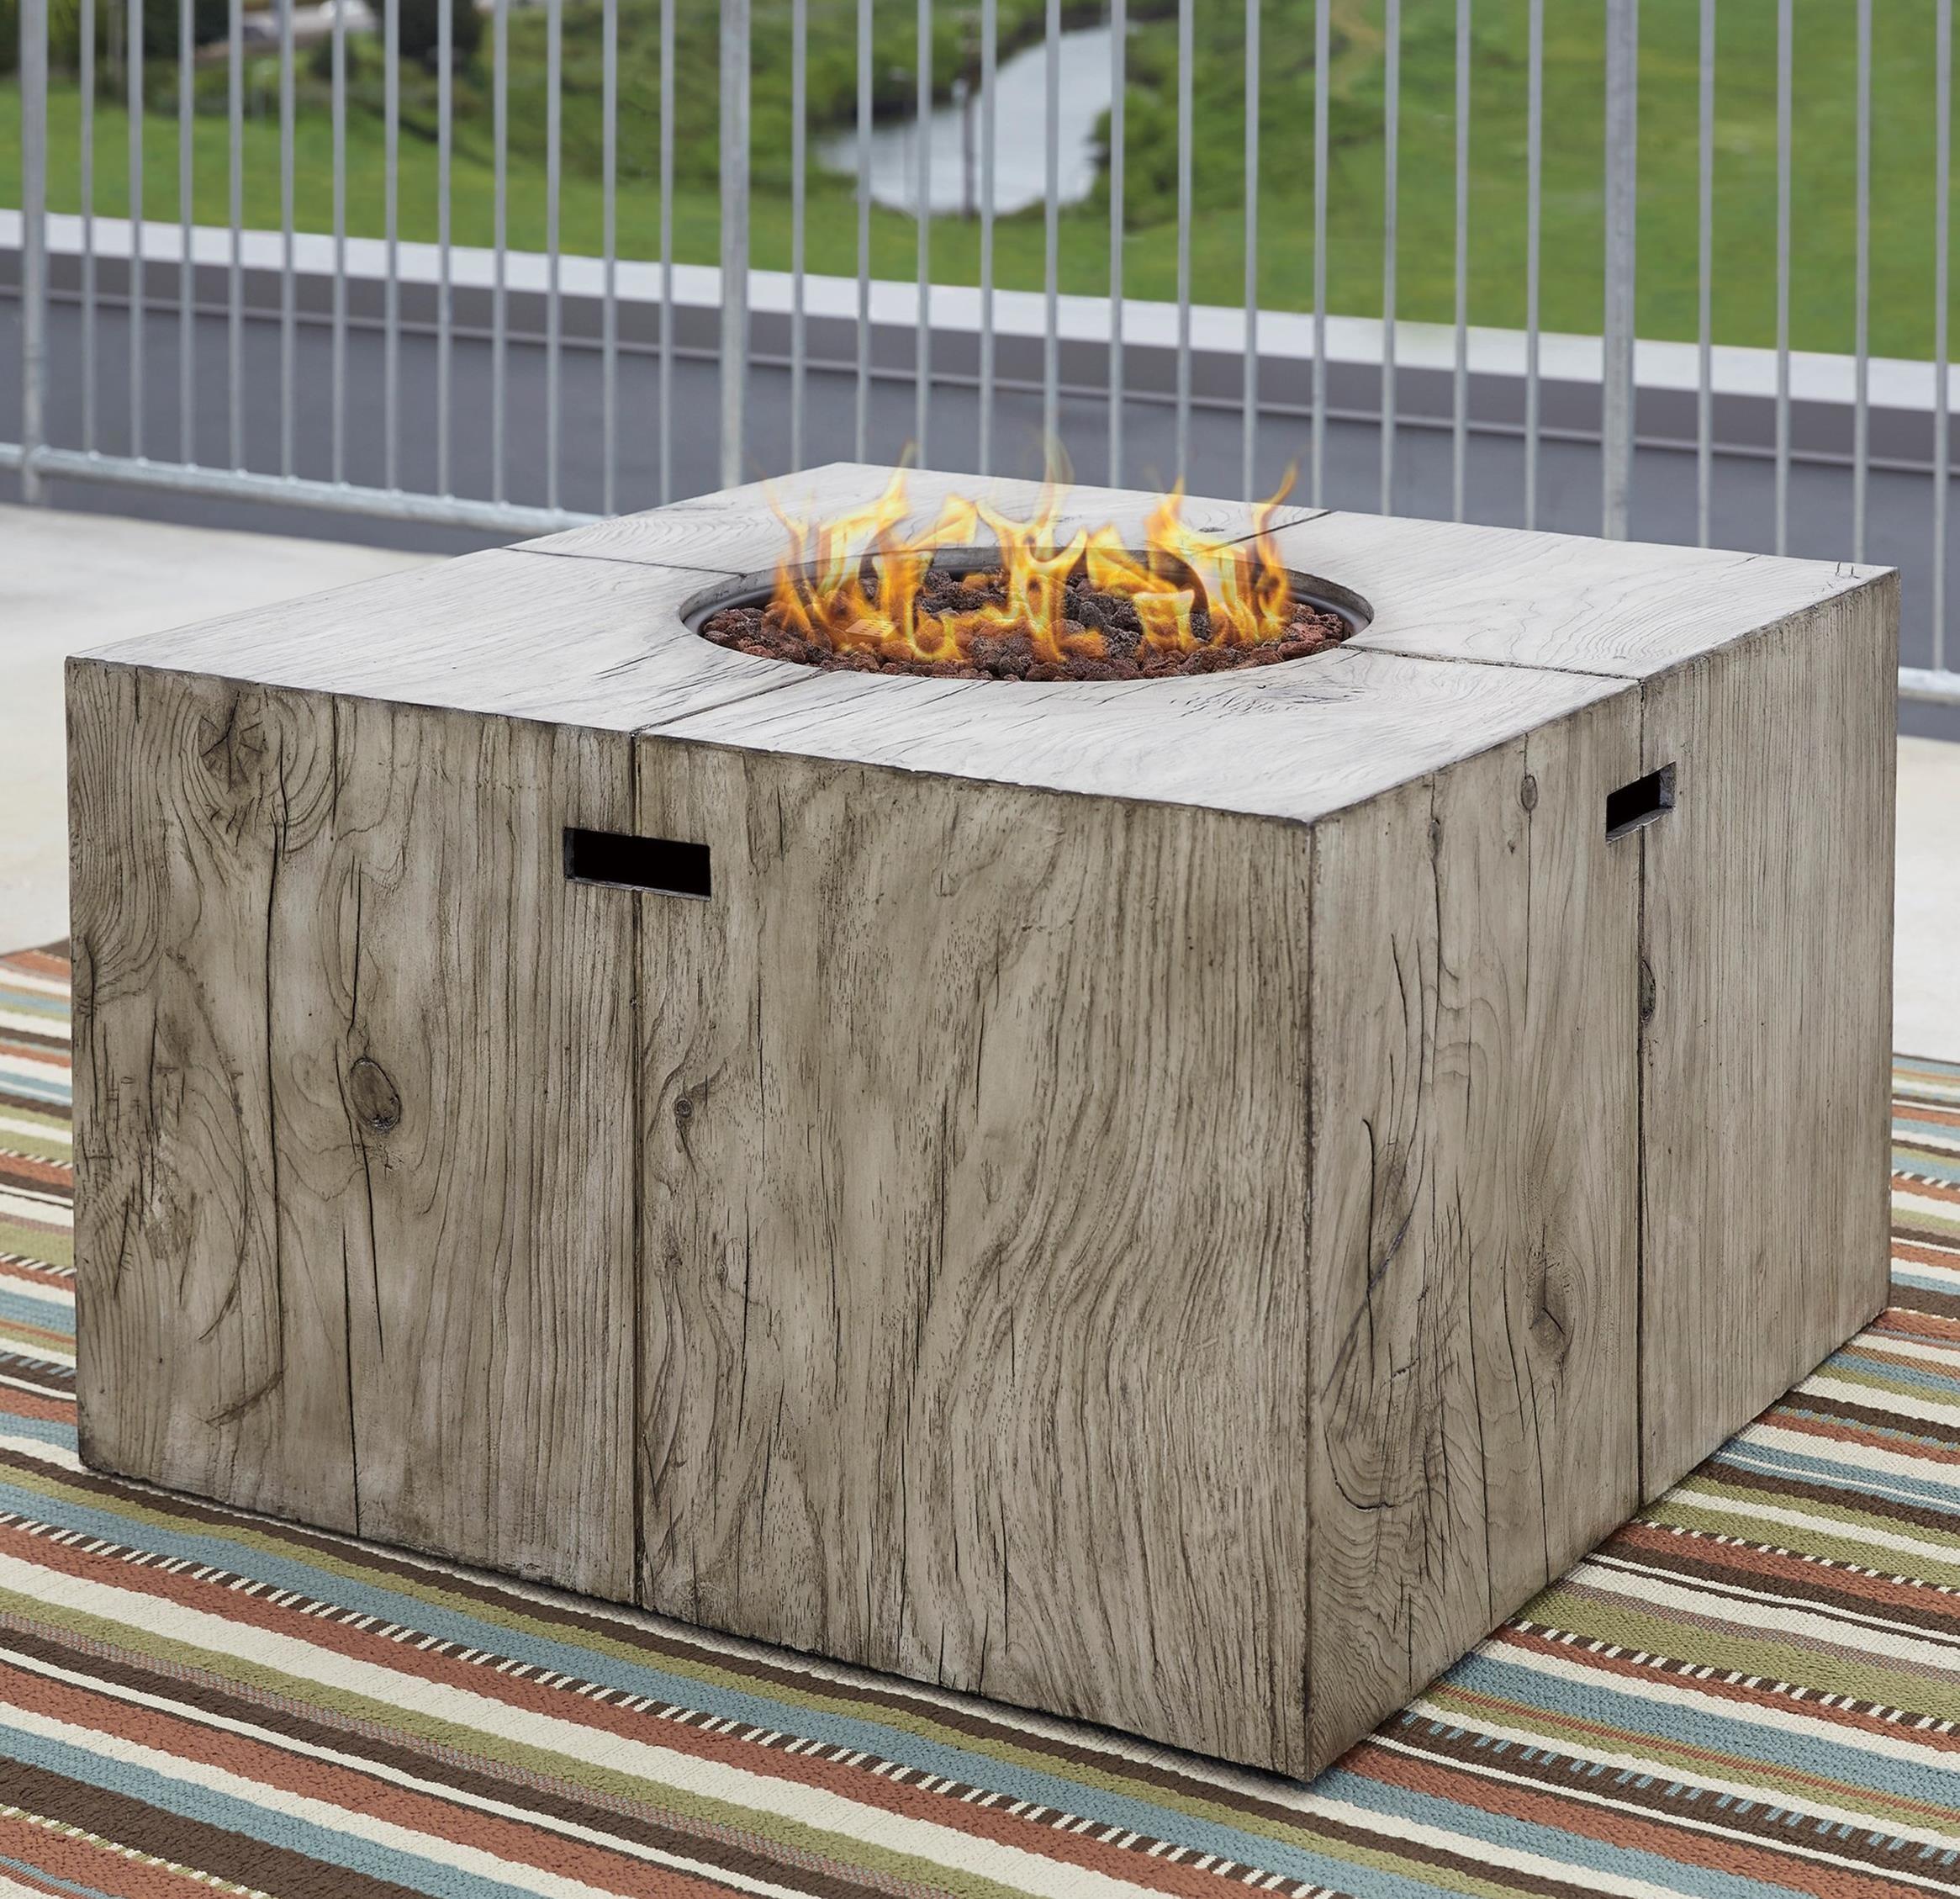 Signature Design by Ashley Peachstone Rustic Style Square Fire Pit